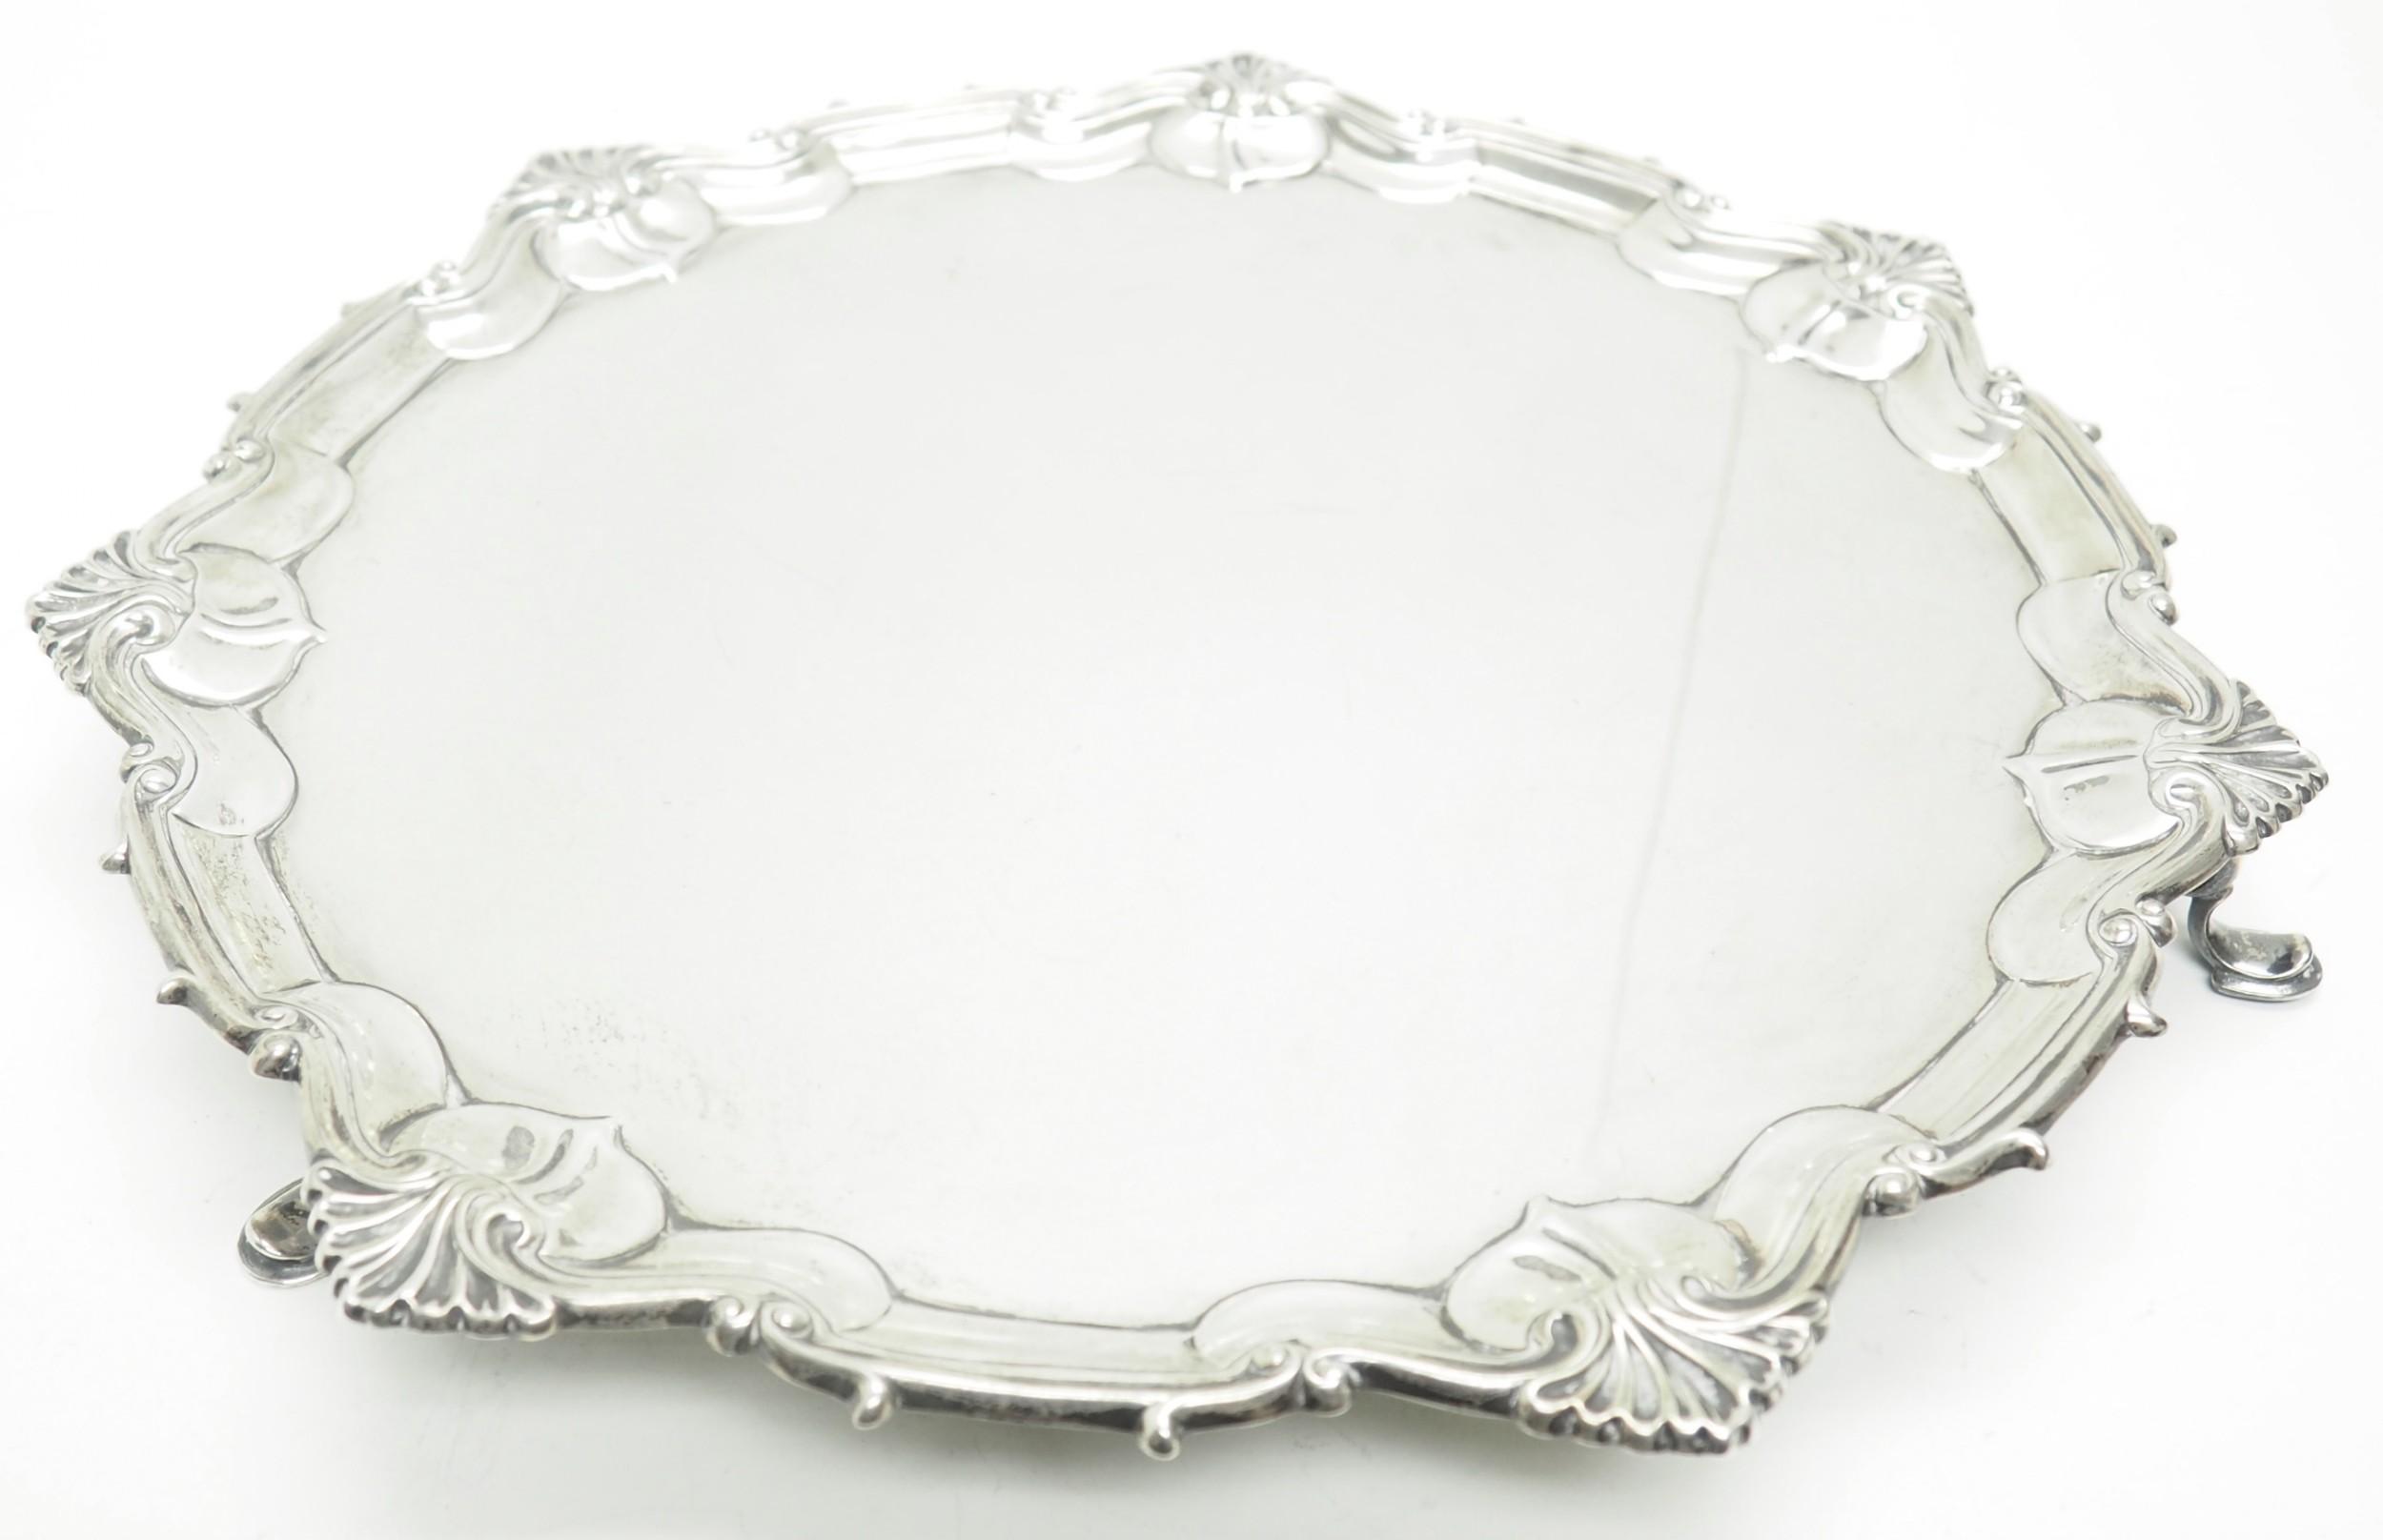 english antique solid silver salver super design fresh and clean circa 1846